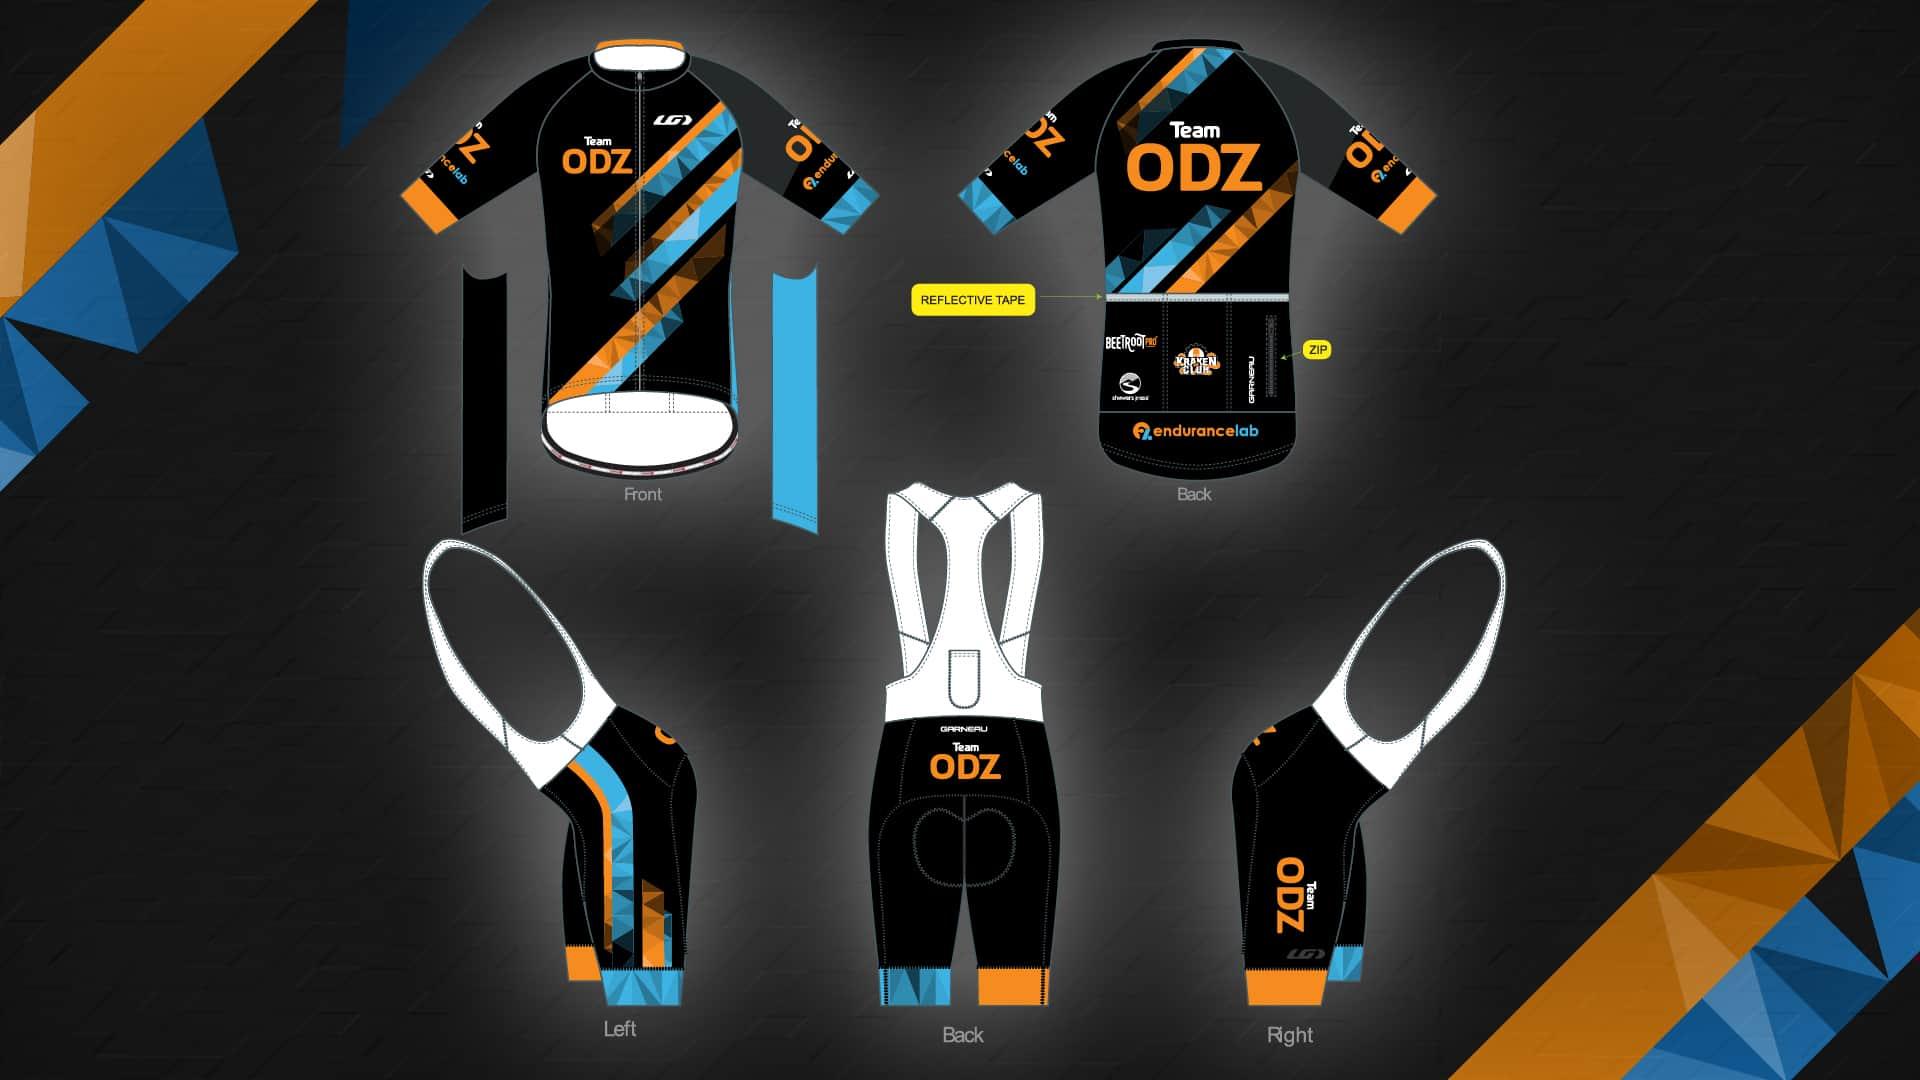 Final ODZ cycling kit layout, all views